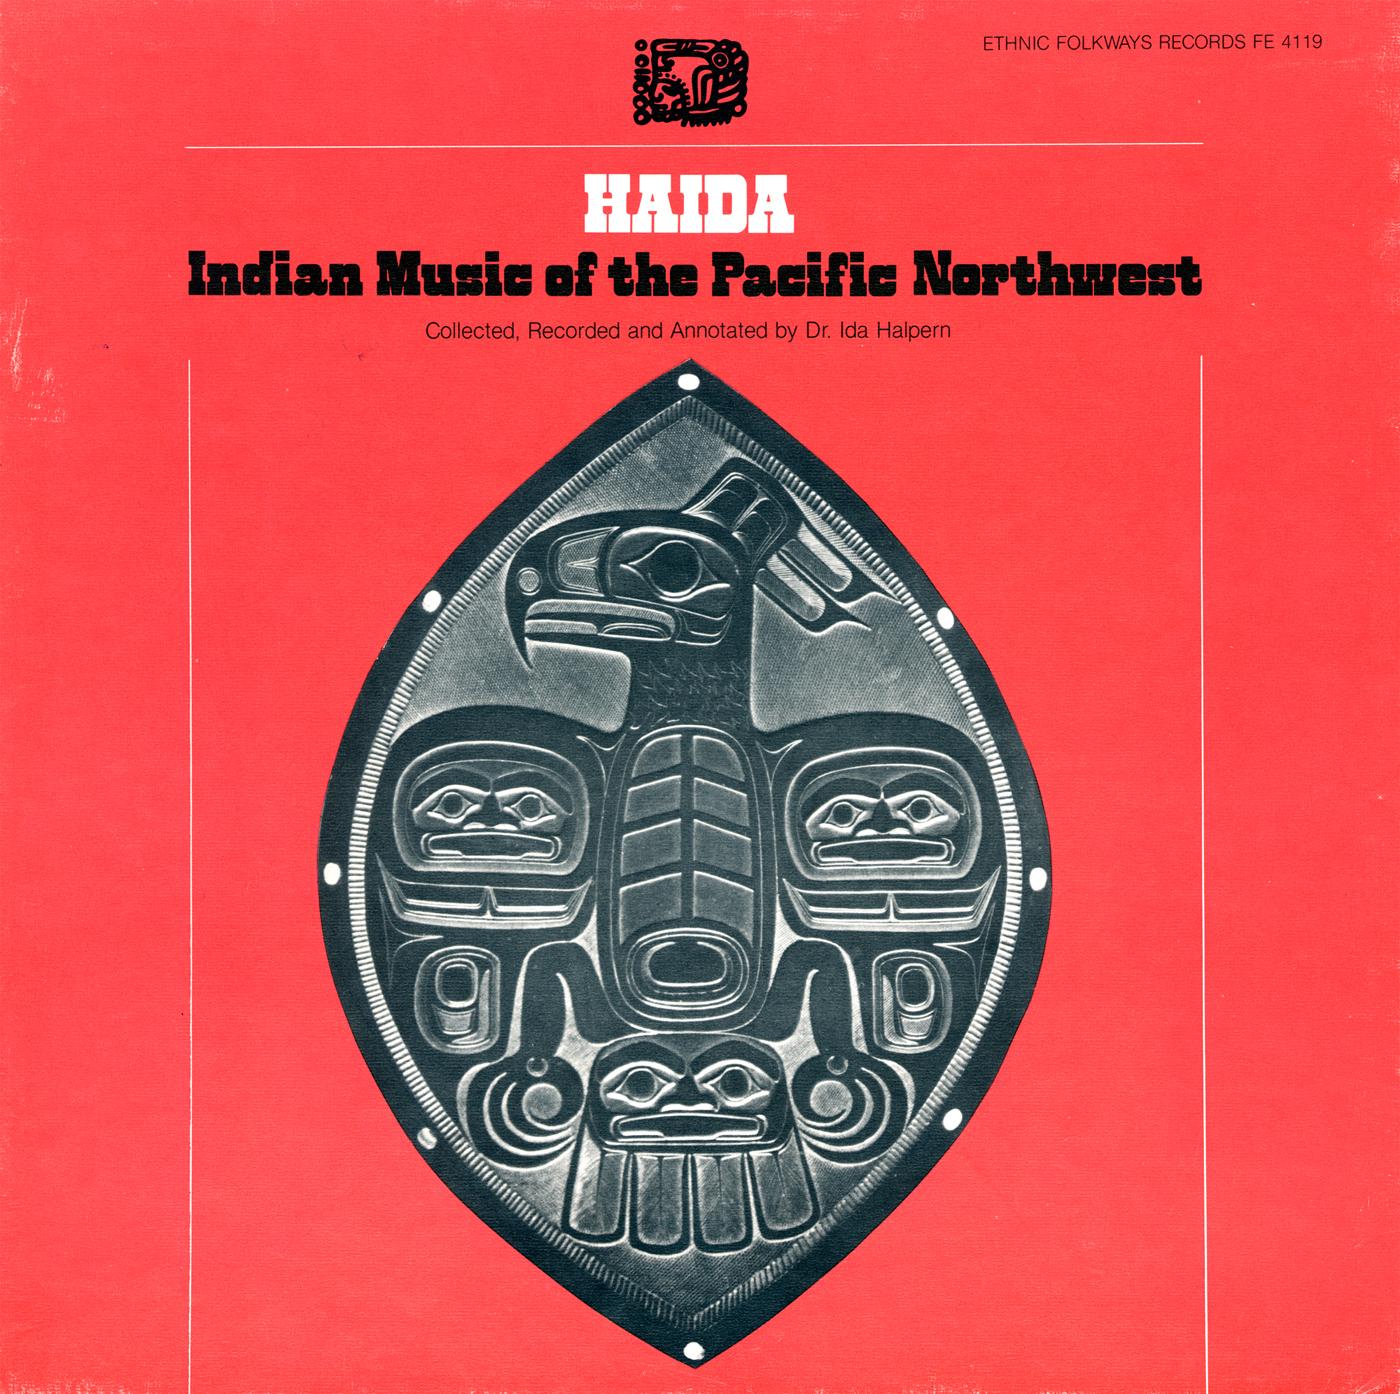 Haida: Indian Music of the Pacific Northwest